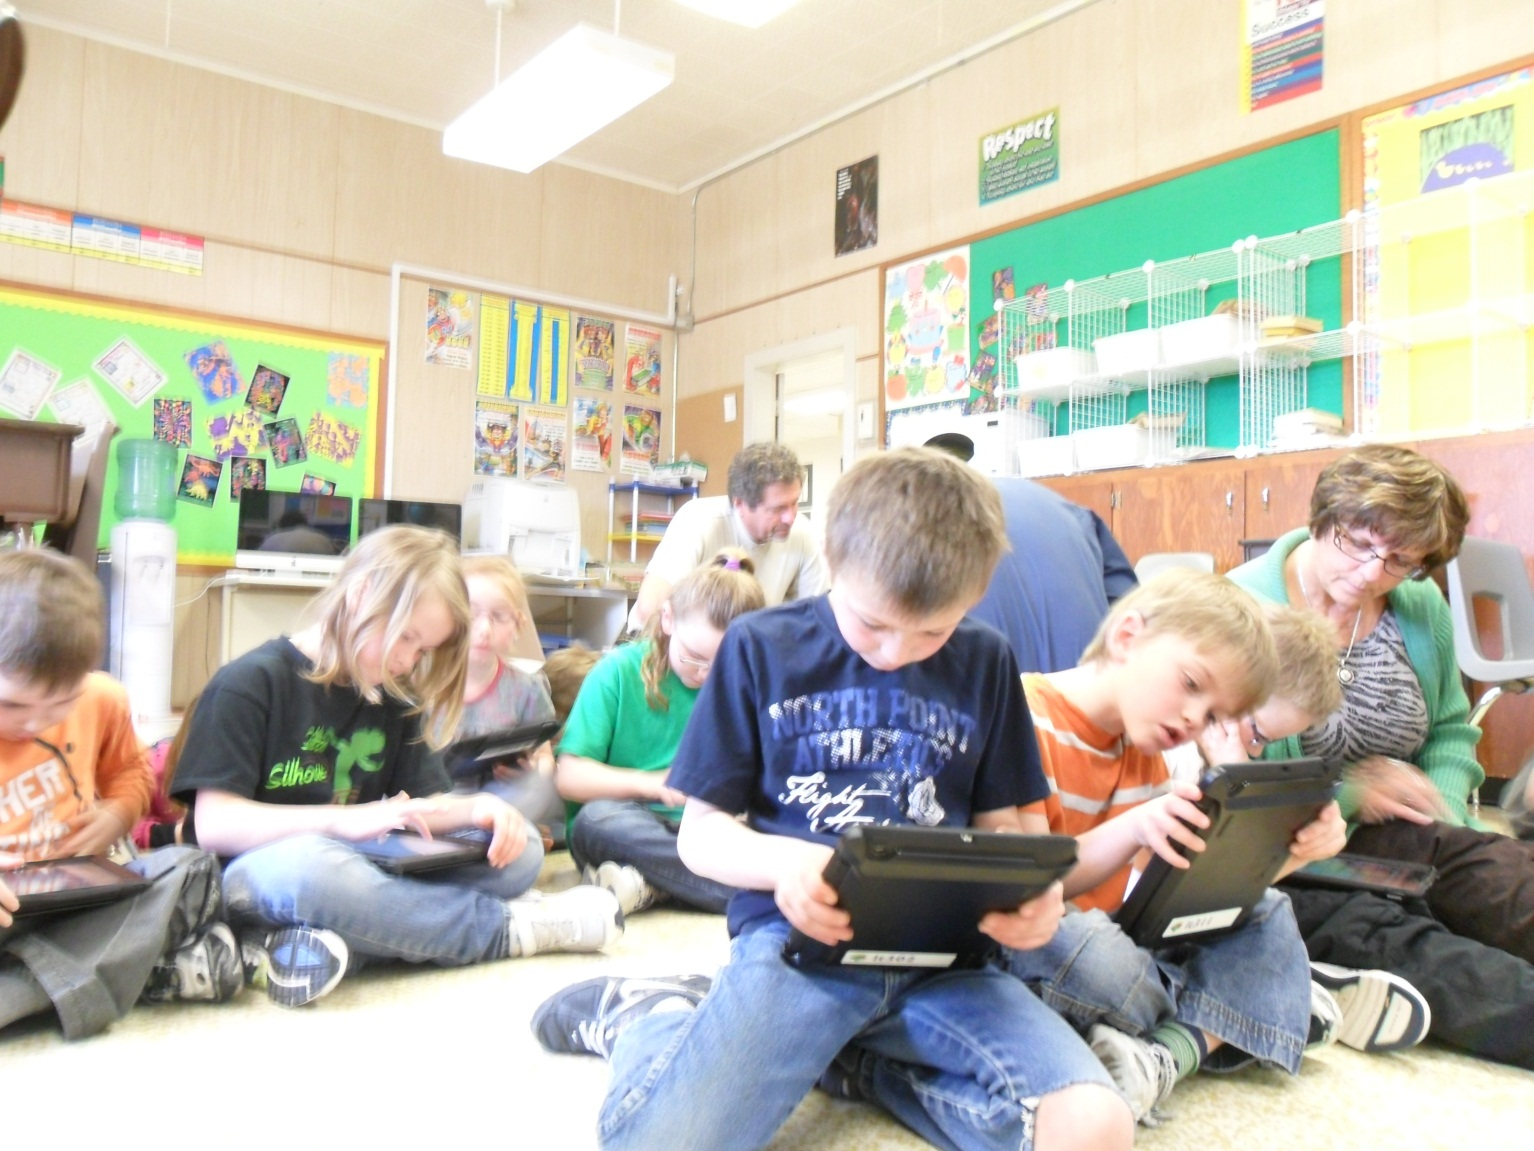 4 Creative Ways to Use iPads in the Classroom